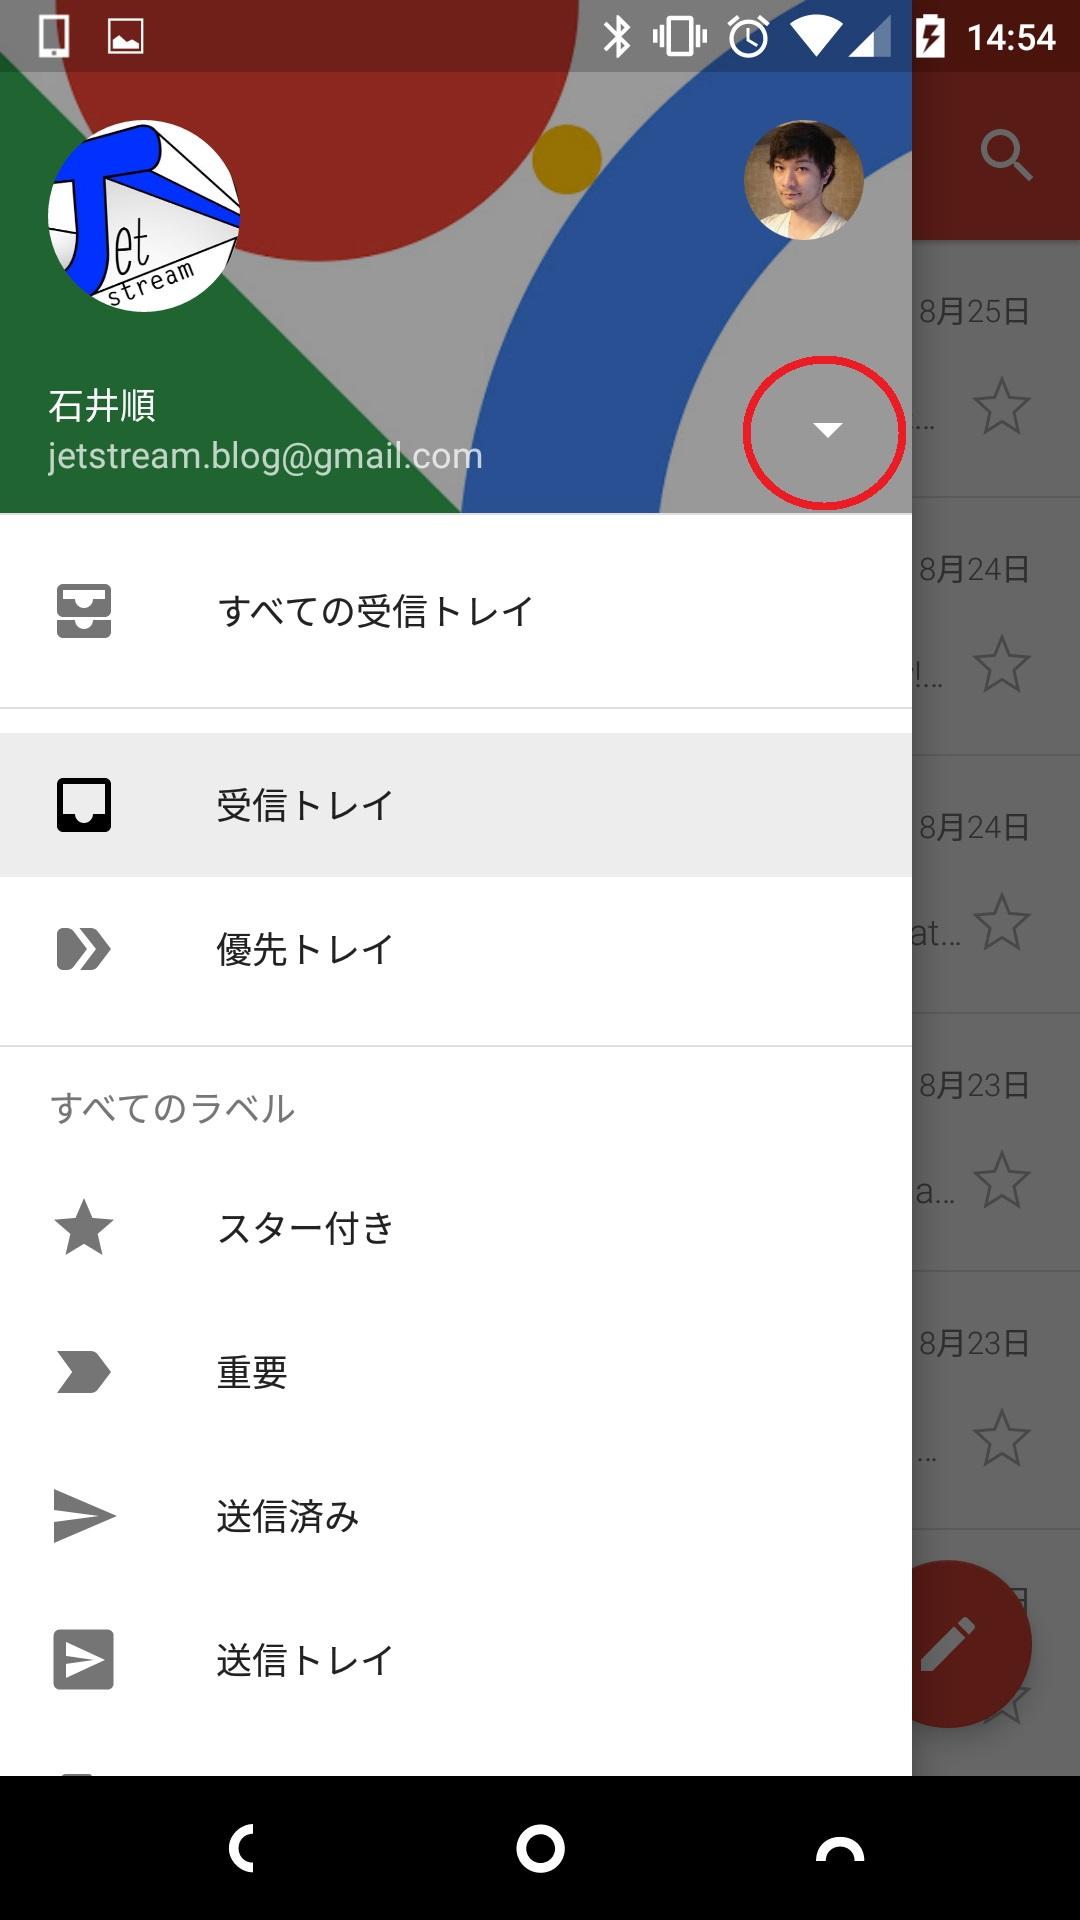 Android版 Gmail アプリにimap形式のメールアカウントを登録する方法 Google Help Heroes By Jetstream